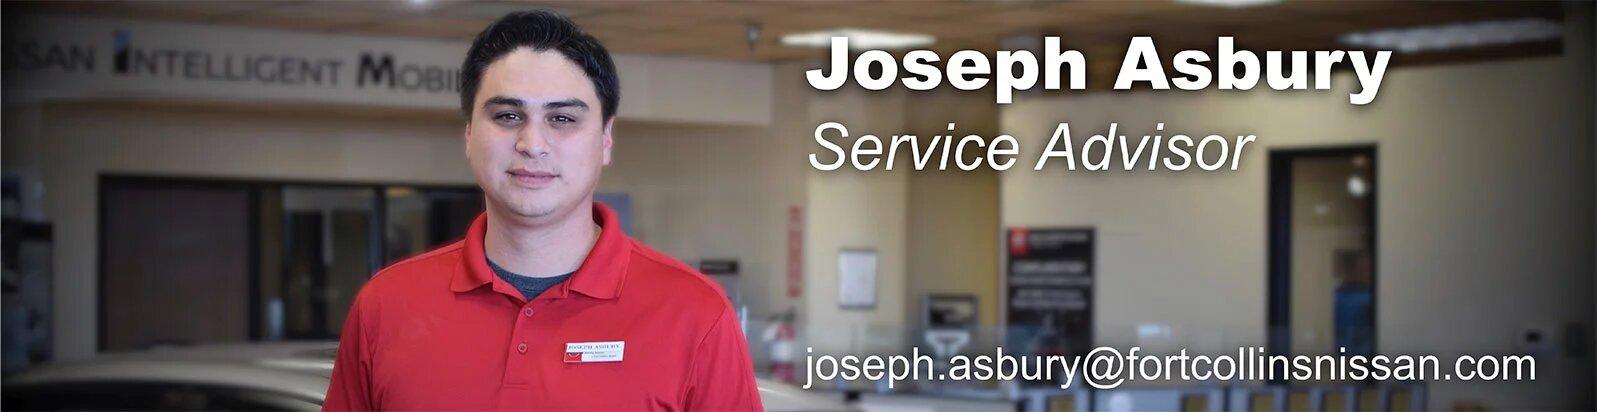 Service Advisor Joseph Asbury